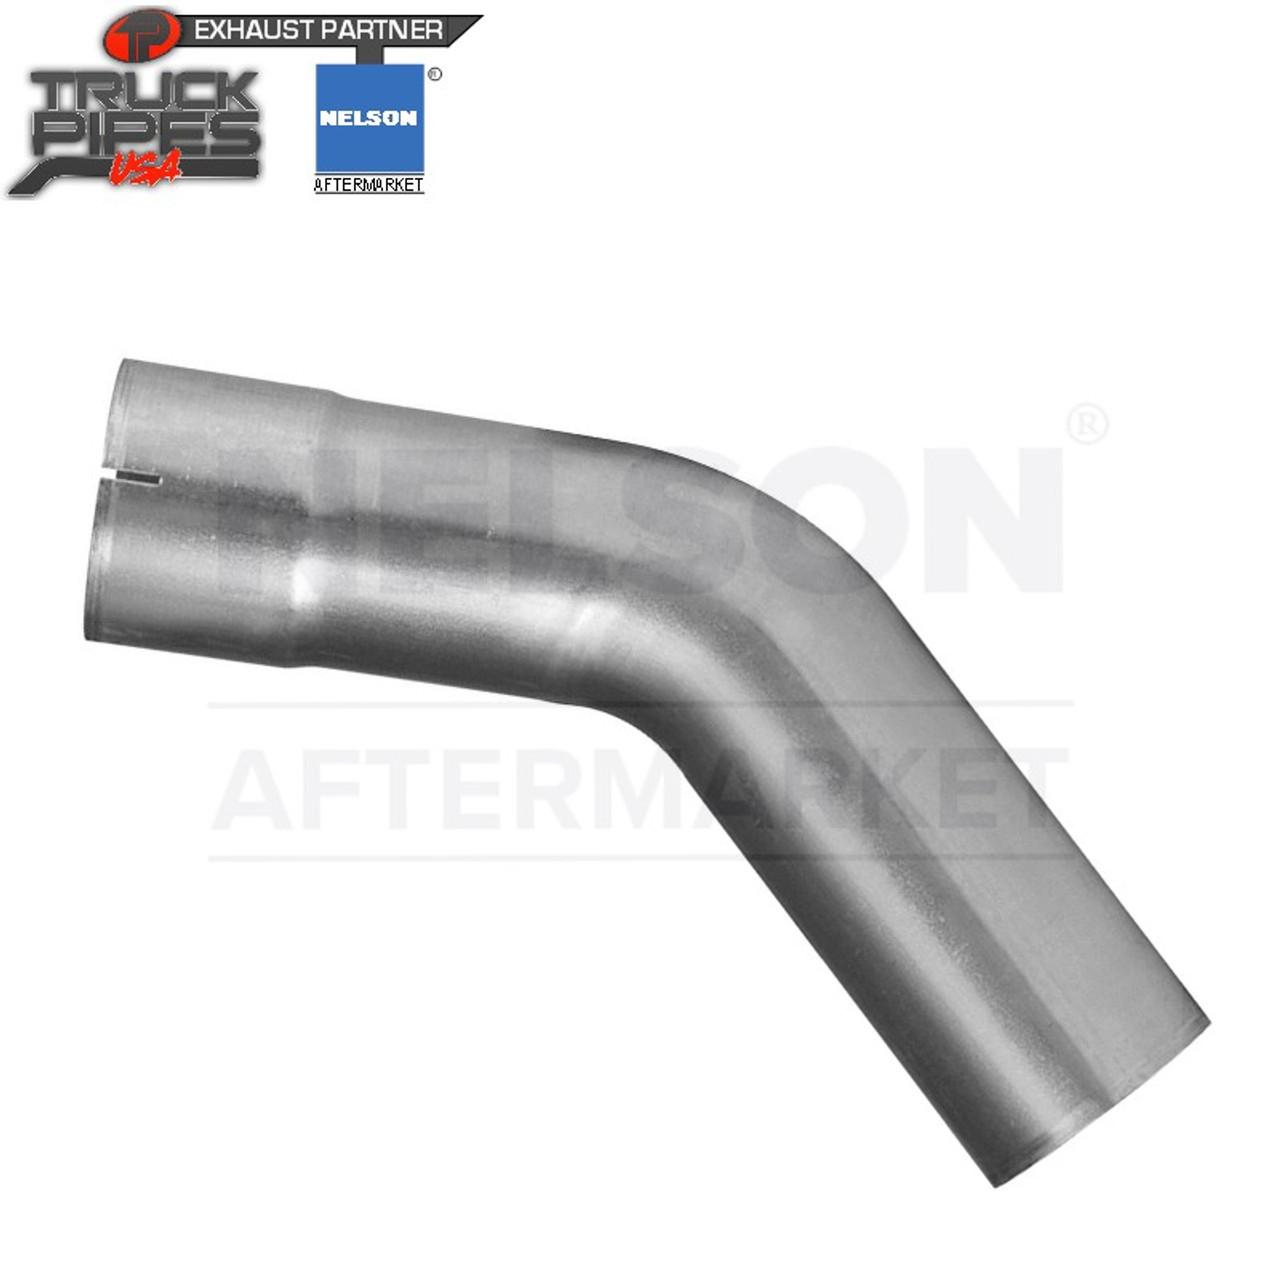 "2.25"" OD-ID 45 Degree Exhaust Elbow Aluminized x 6"" Leg Length Nelson 89241A"